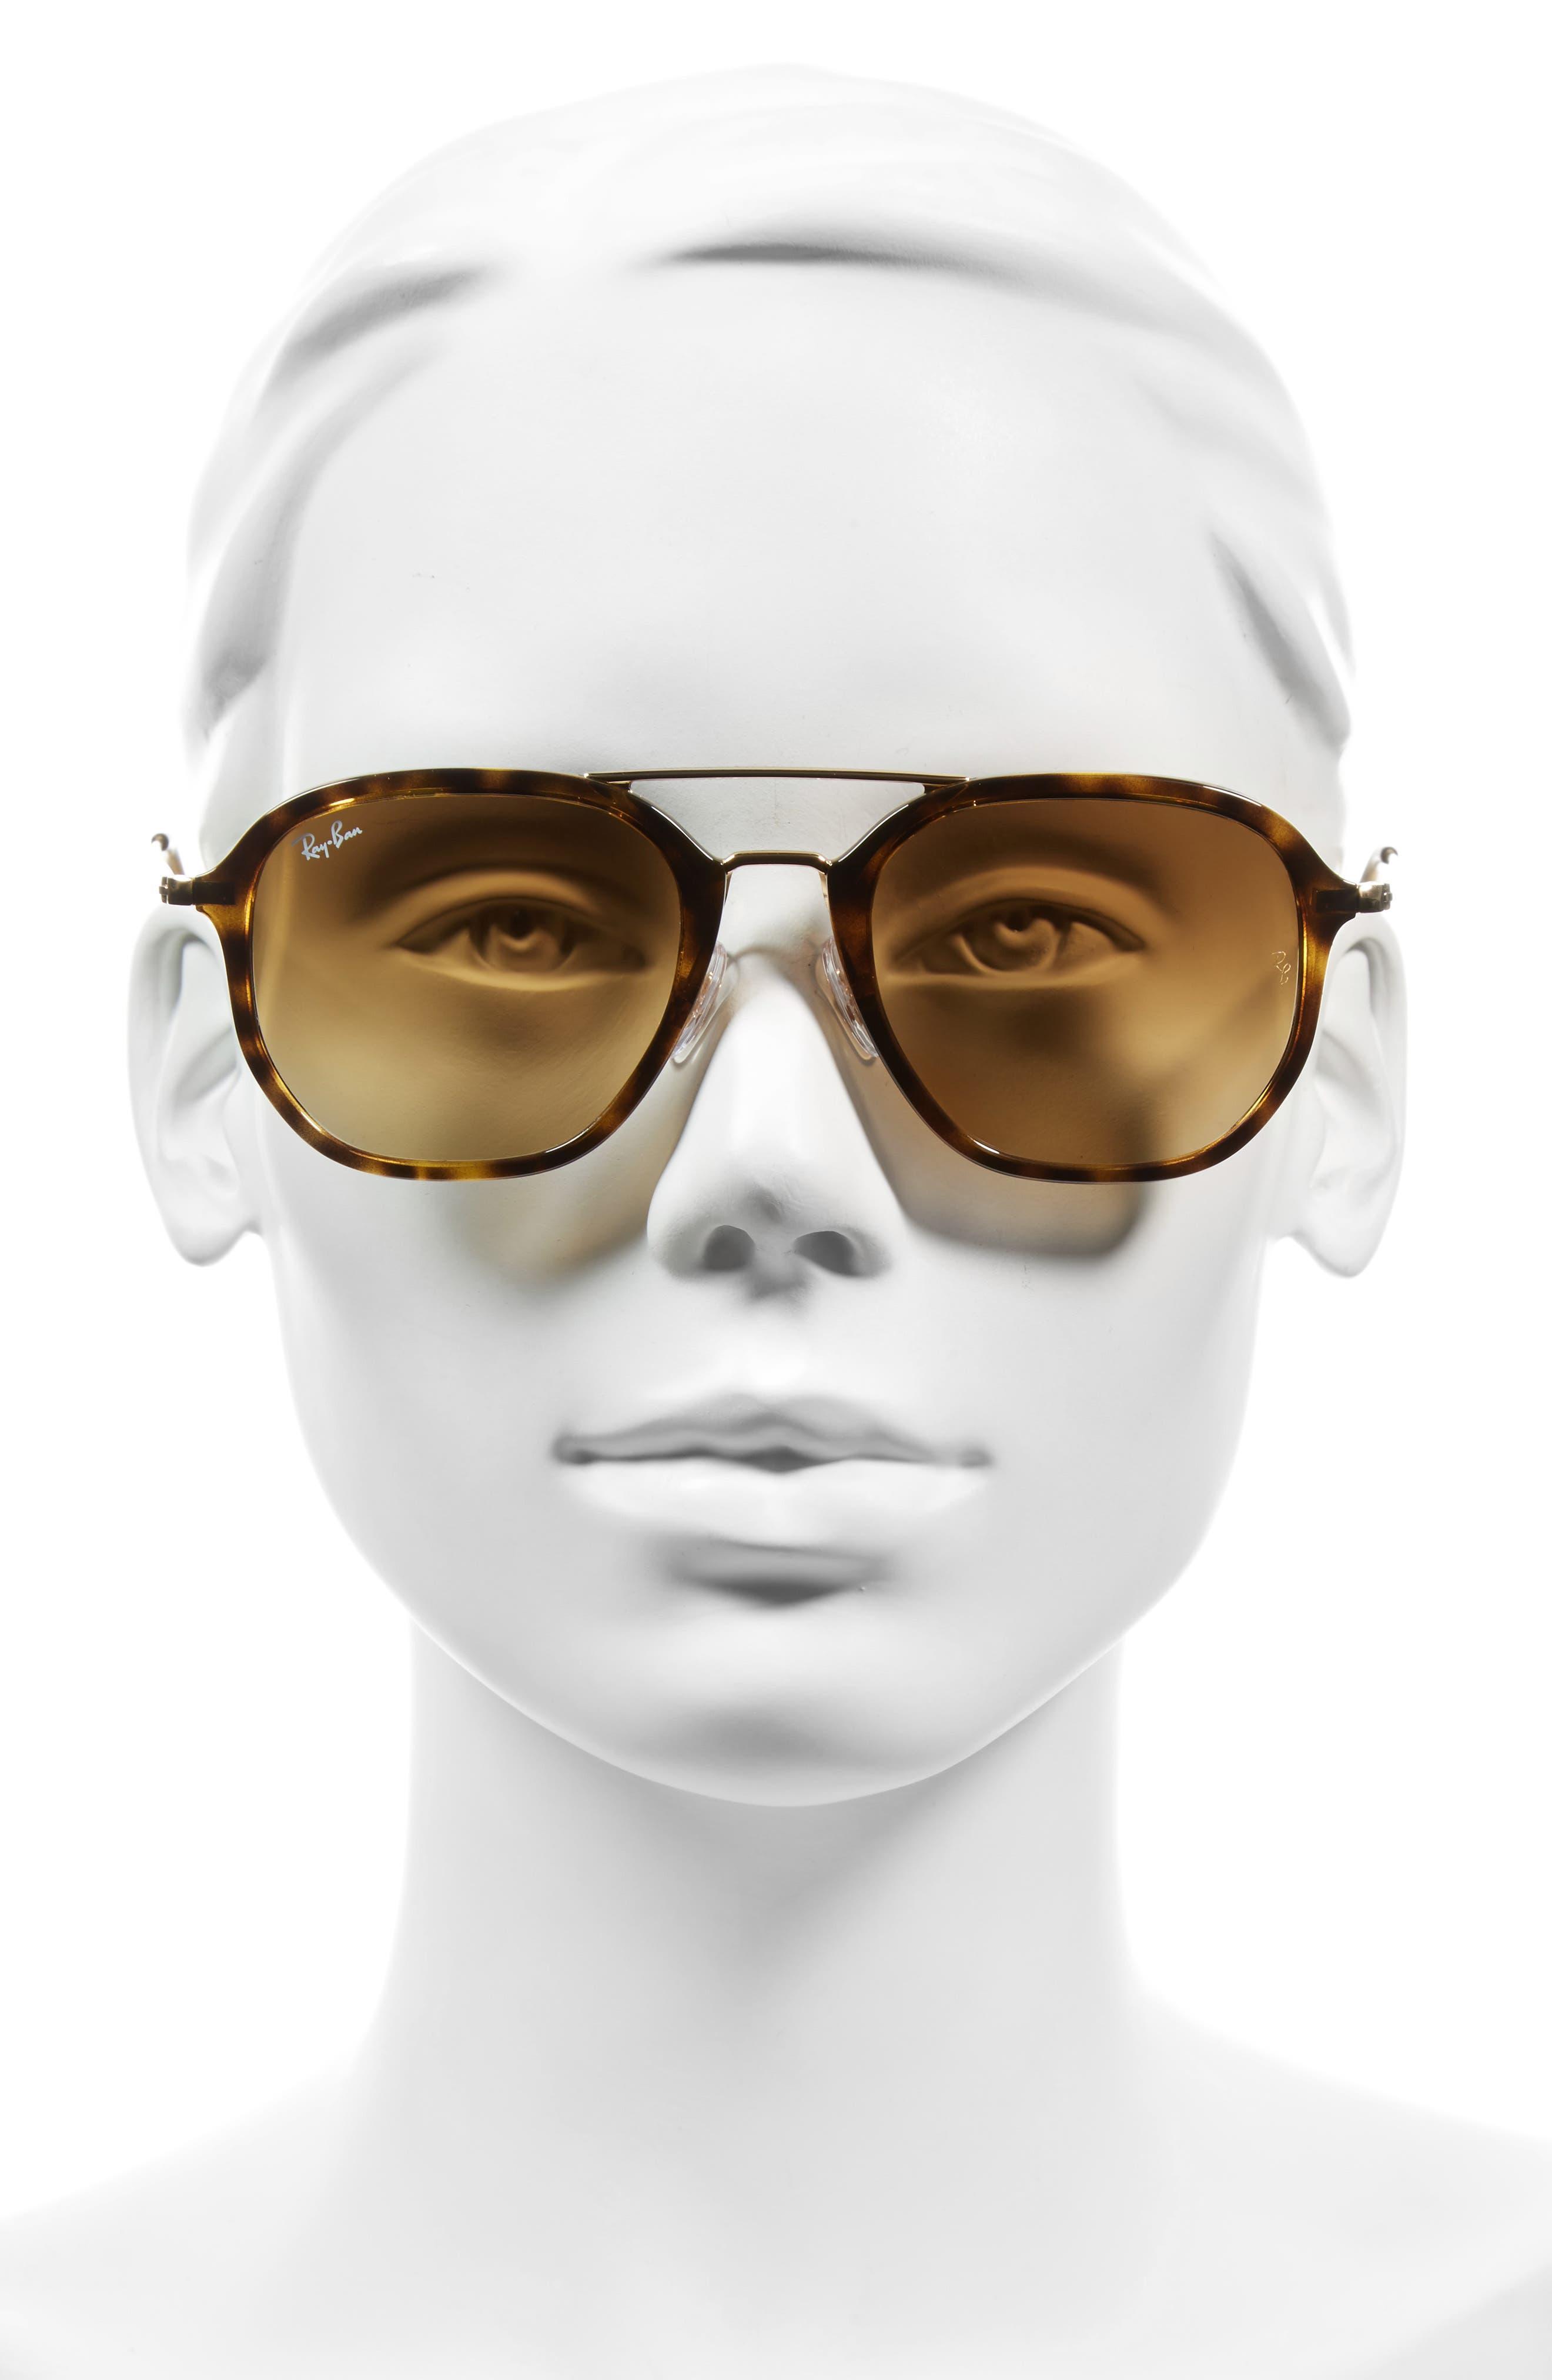 52mm Square Sunglasses,                             Alternate thumbnail 2, color,                             Havana